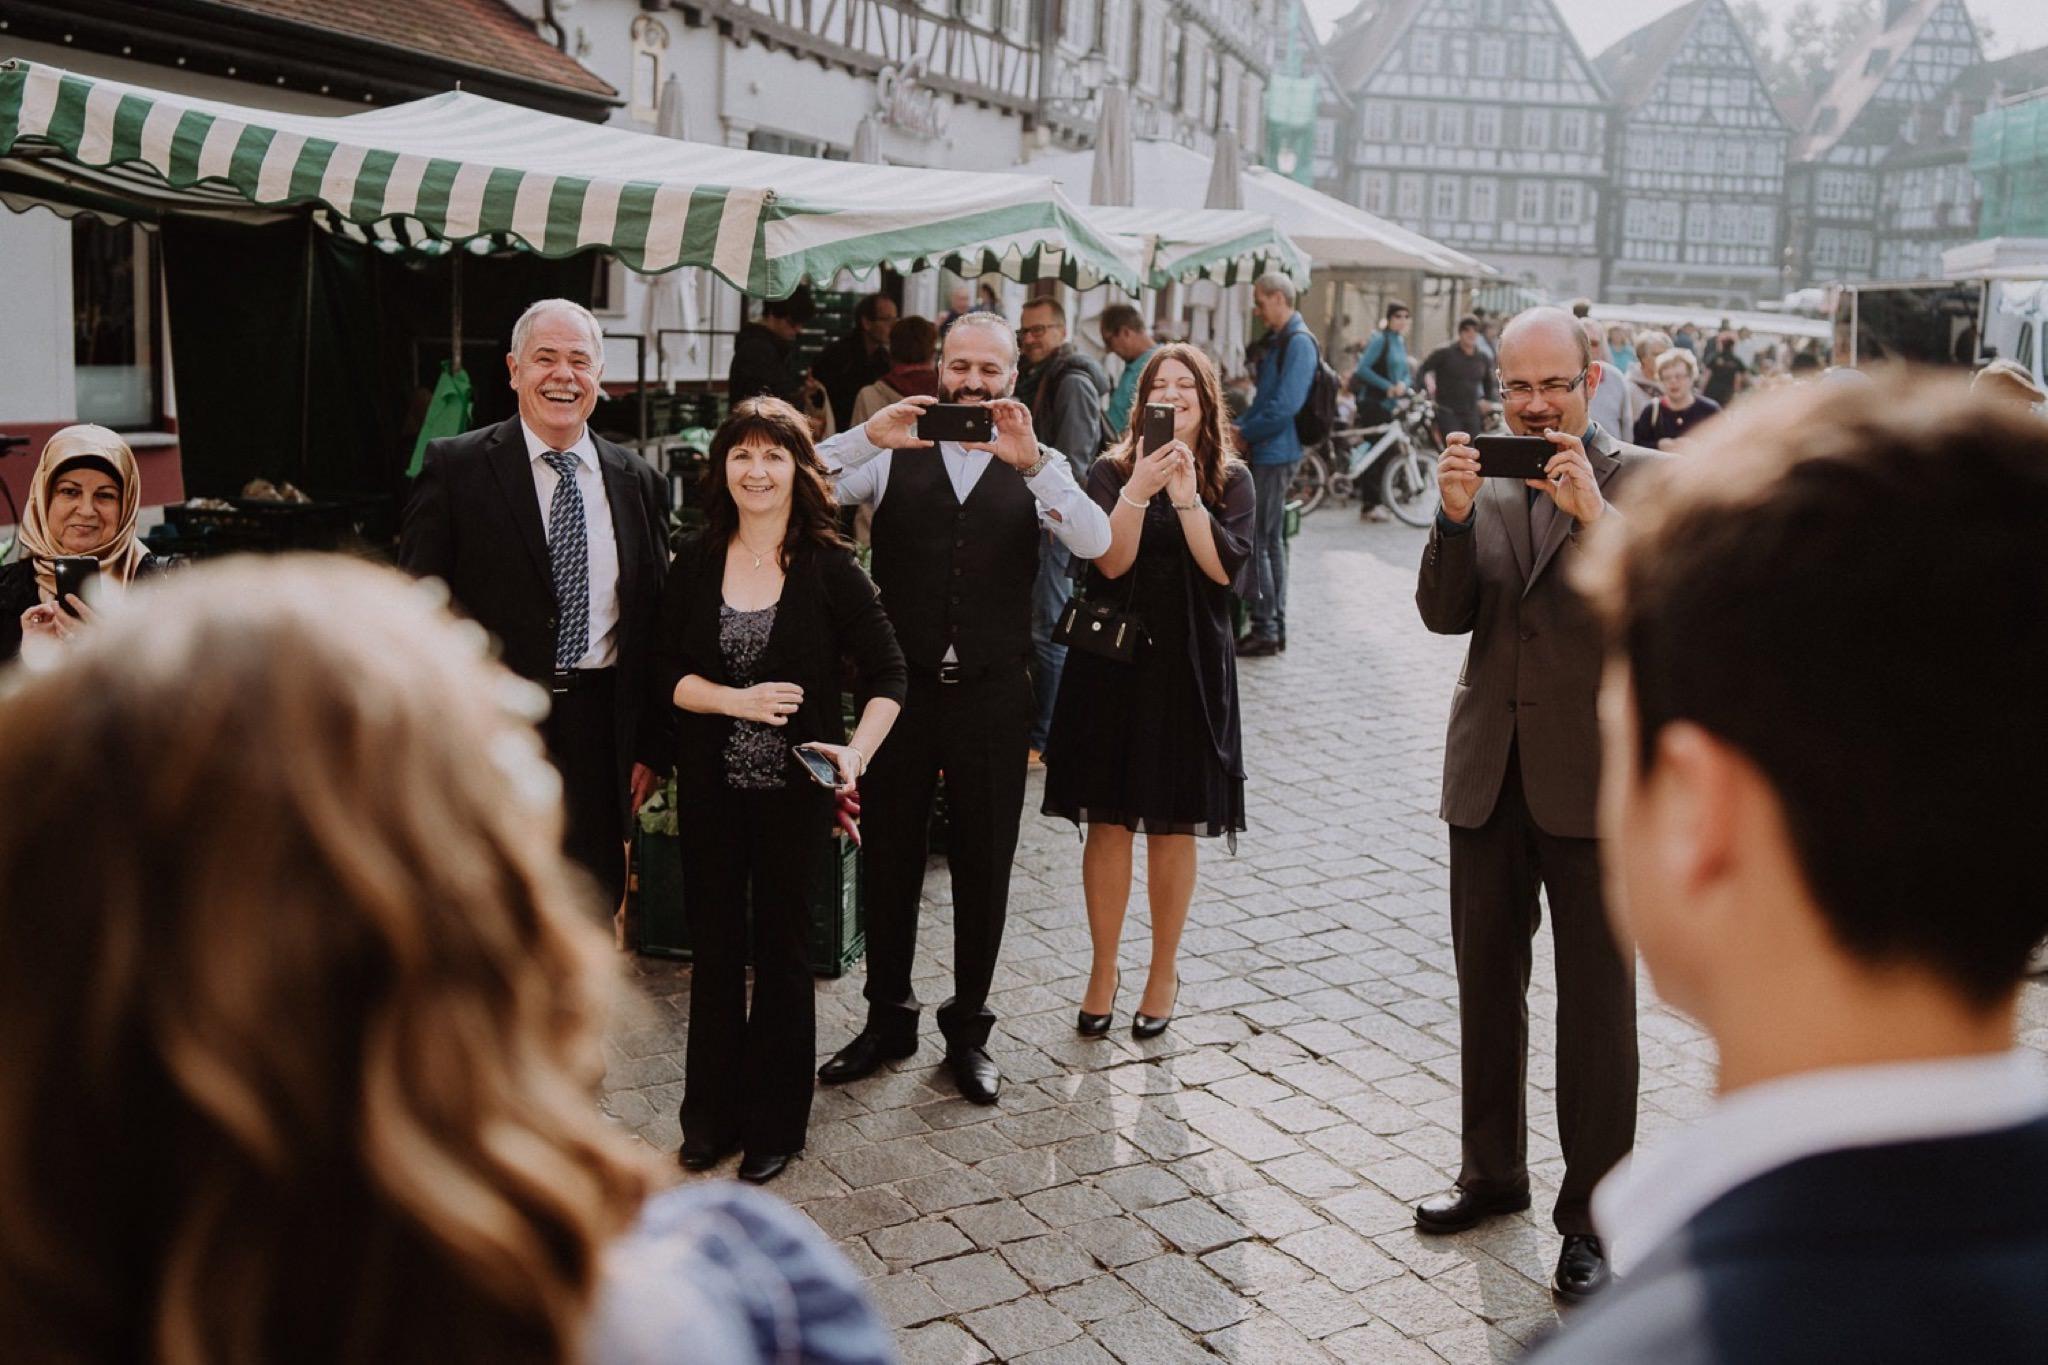 wedding photographer hamilton new zealand 1004